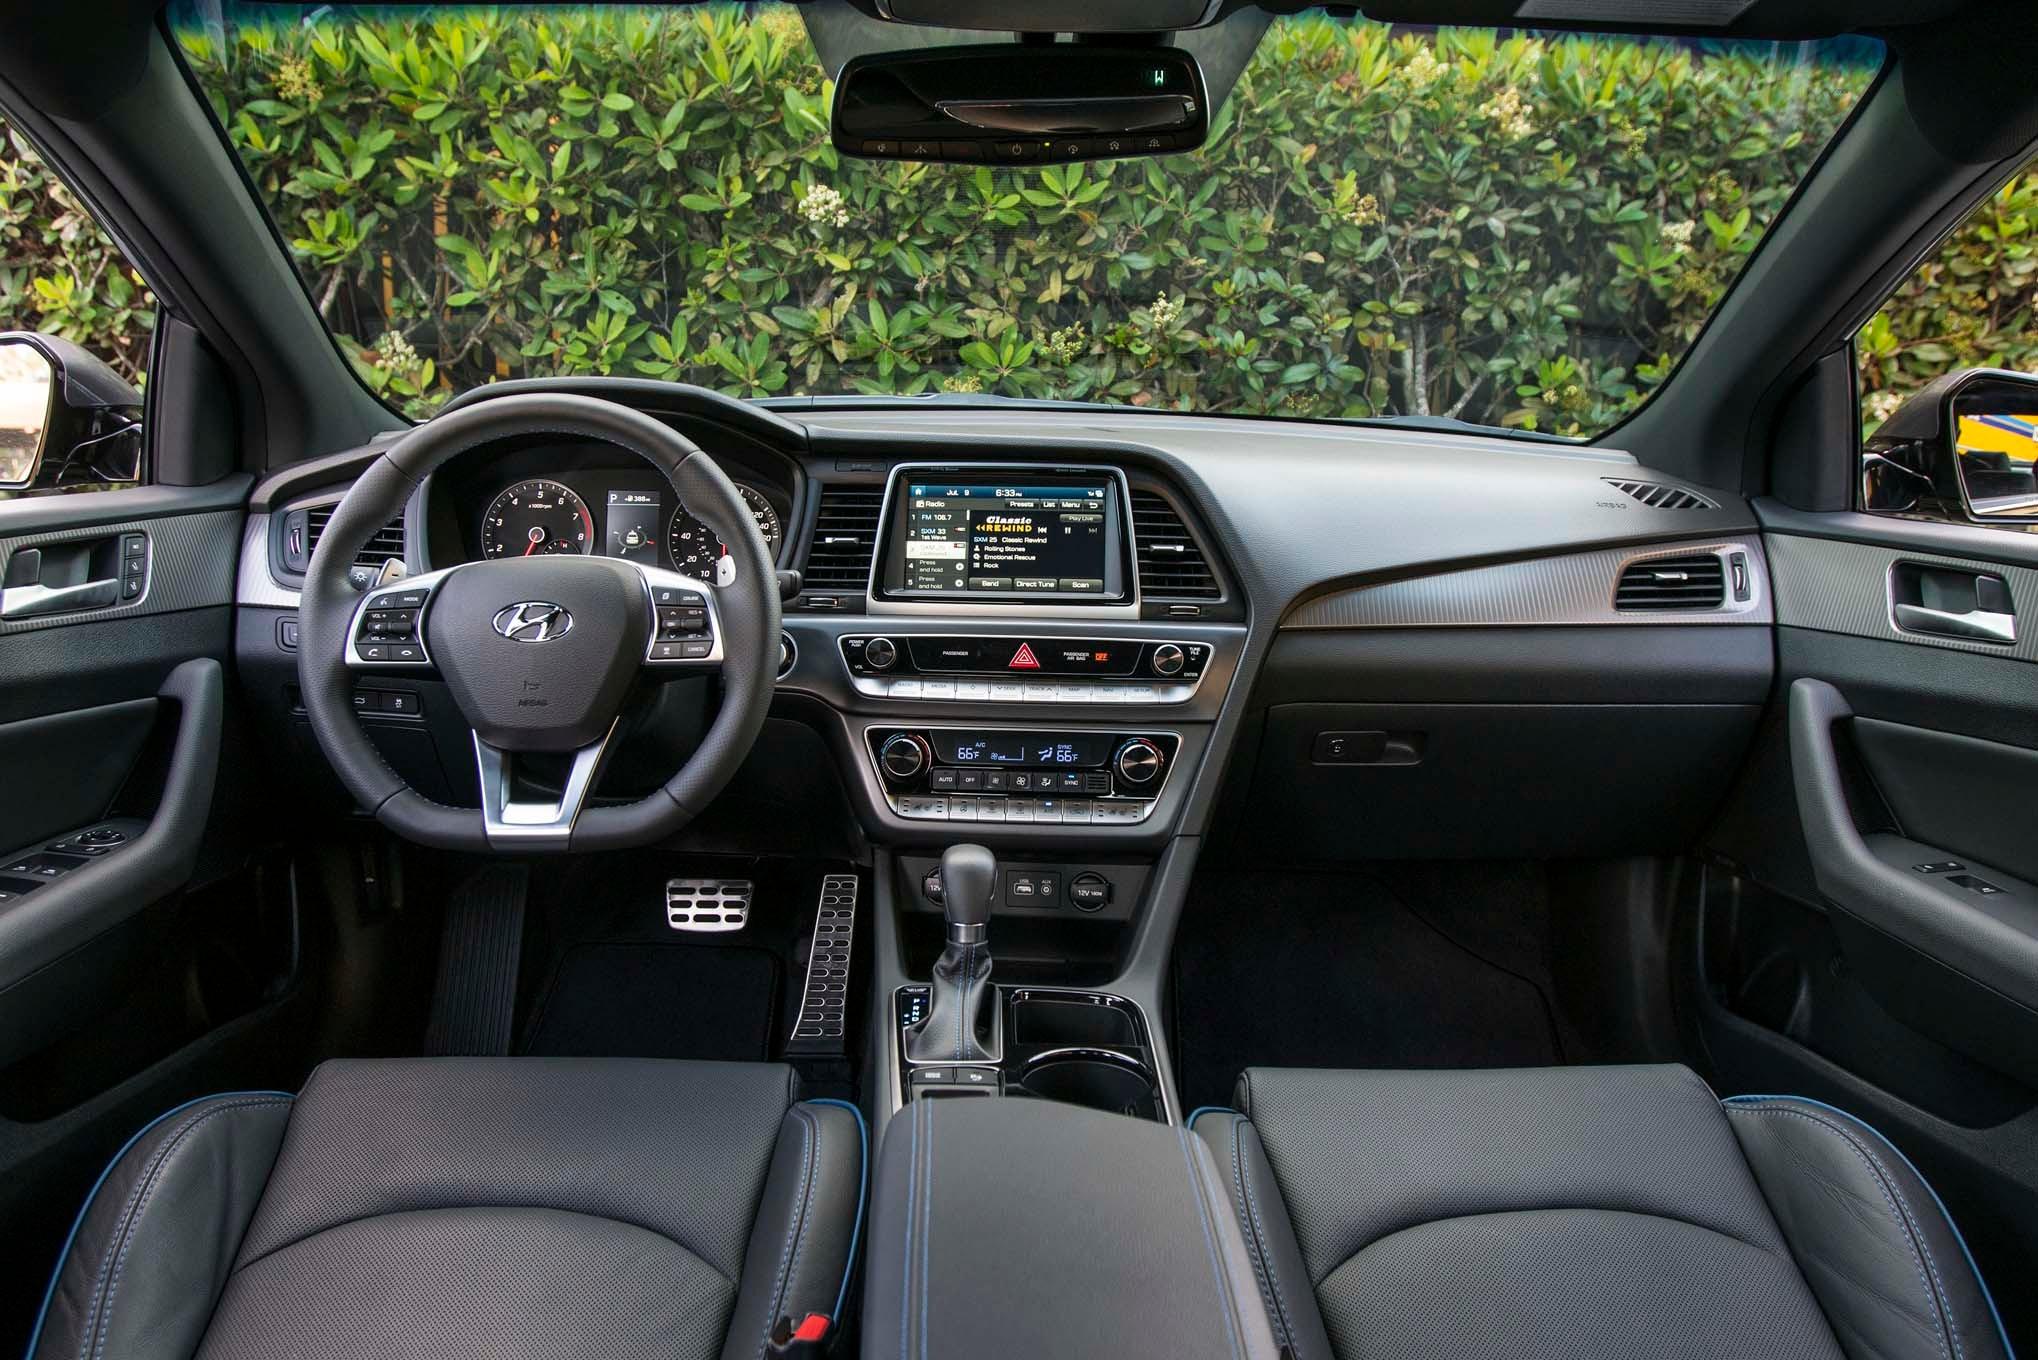 Hyundai Sonata 2 0 T Limited >> 2018 Hyundai Sonata First Drive Review | Automobile Magazine